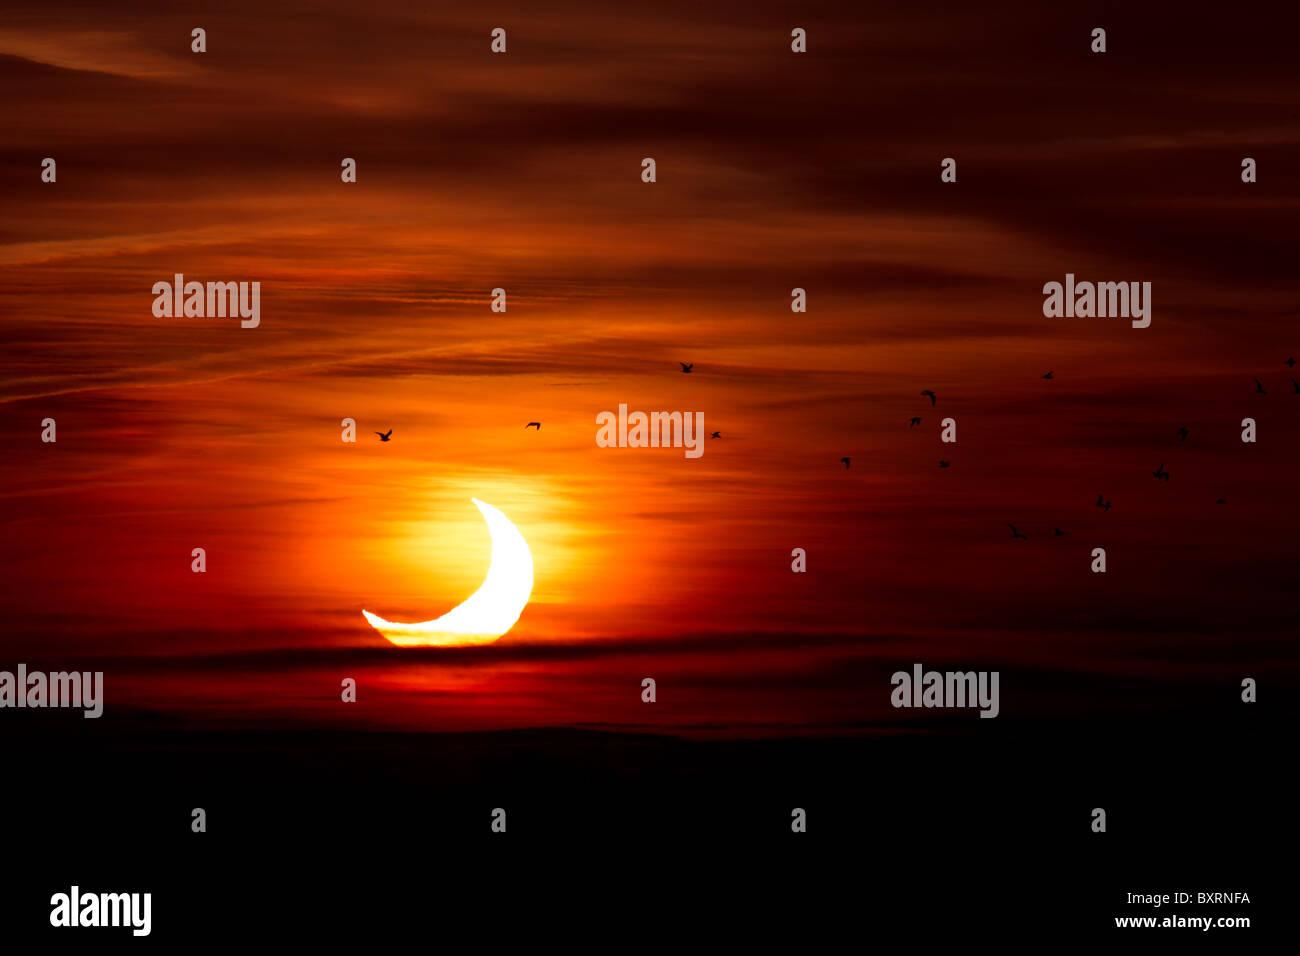 Partial Solar Eclipse in Cambridgeshire UK 4th January 2011 at Sunrise - Stock Image